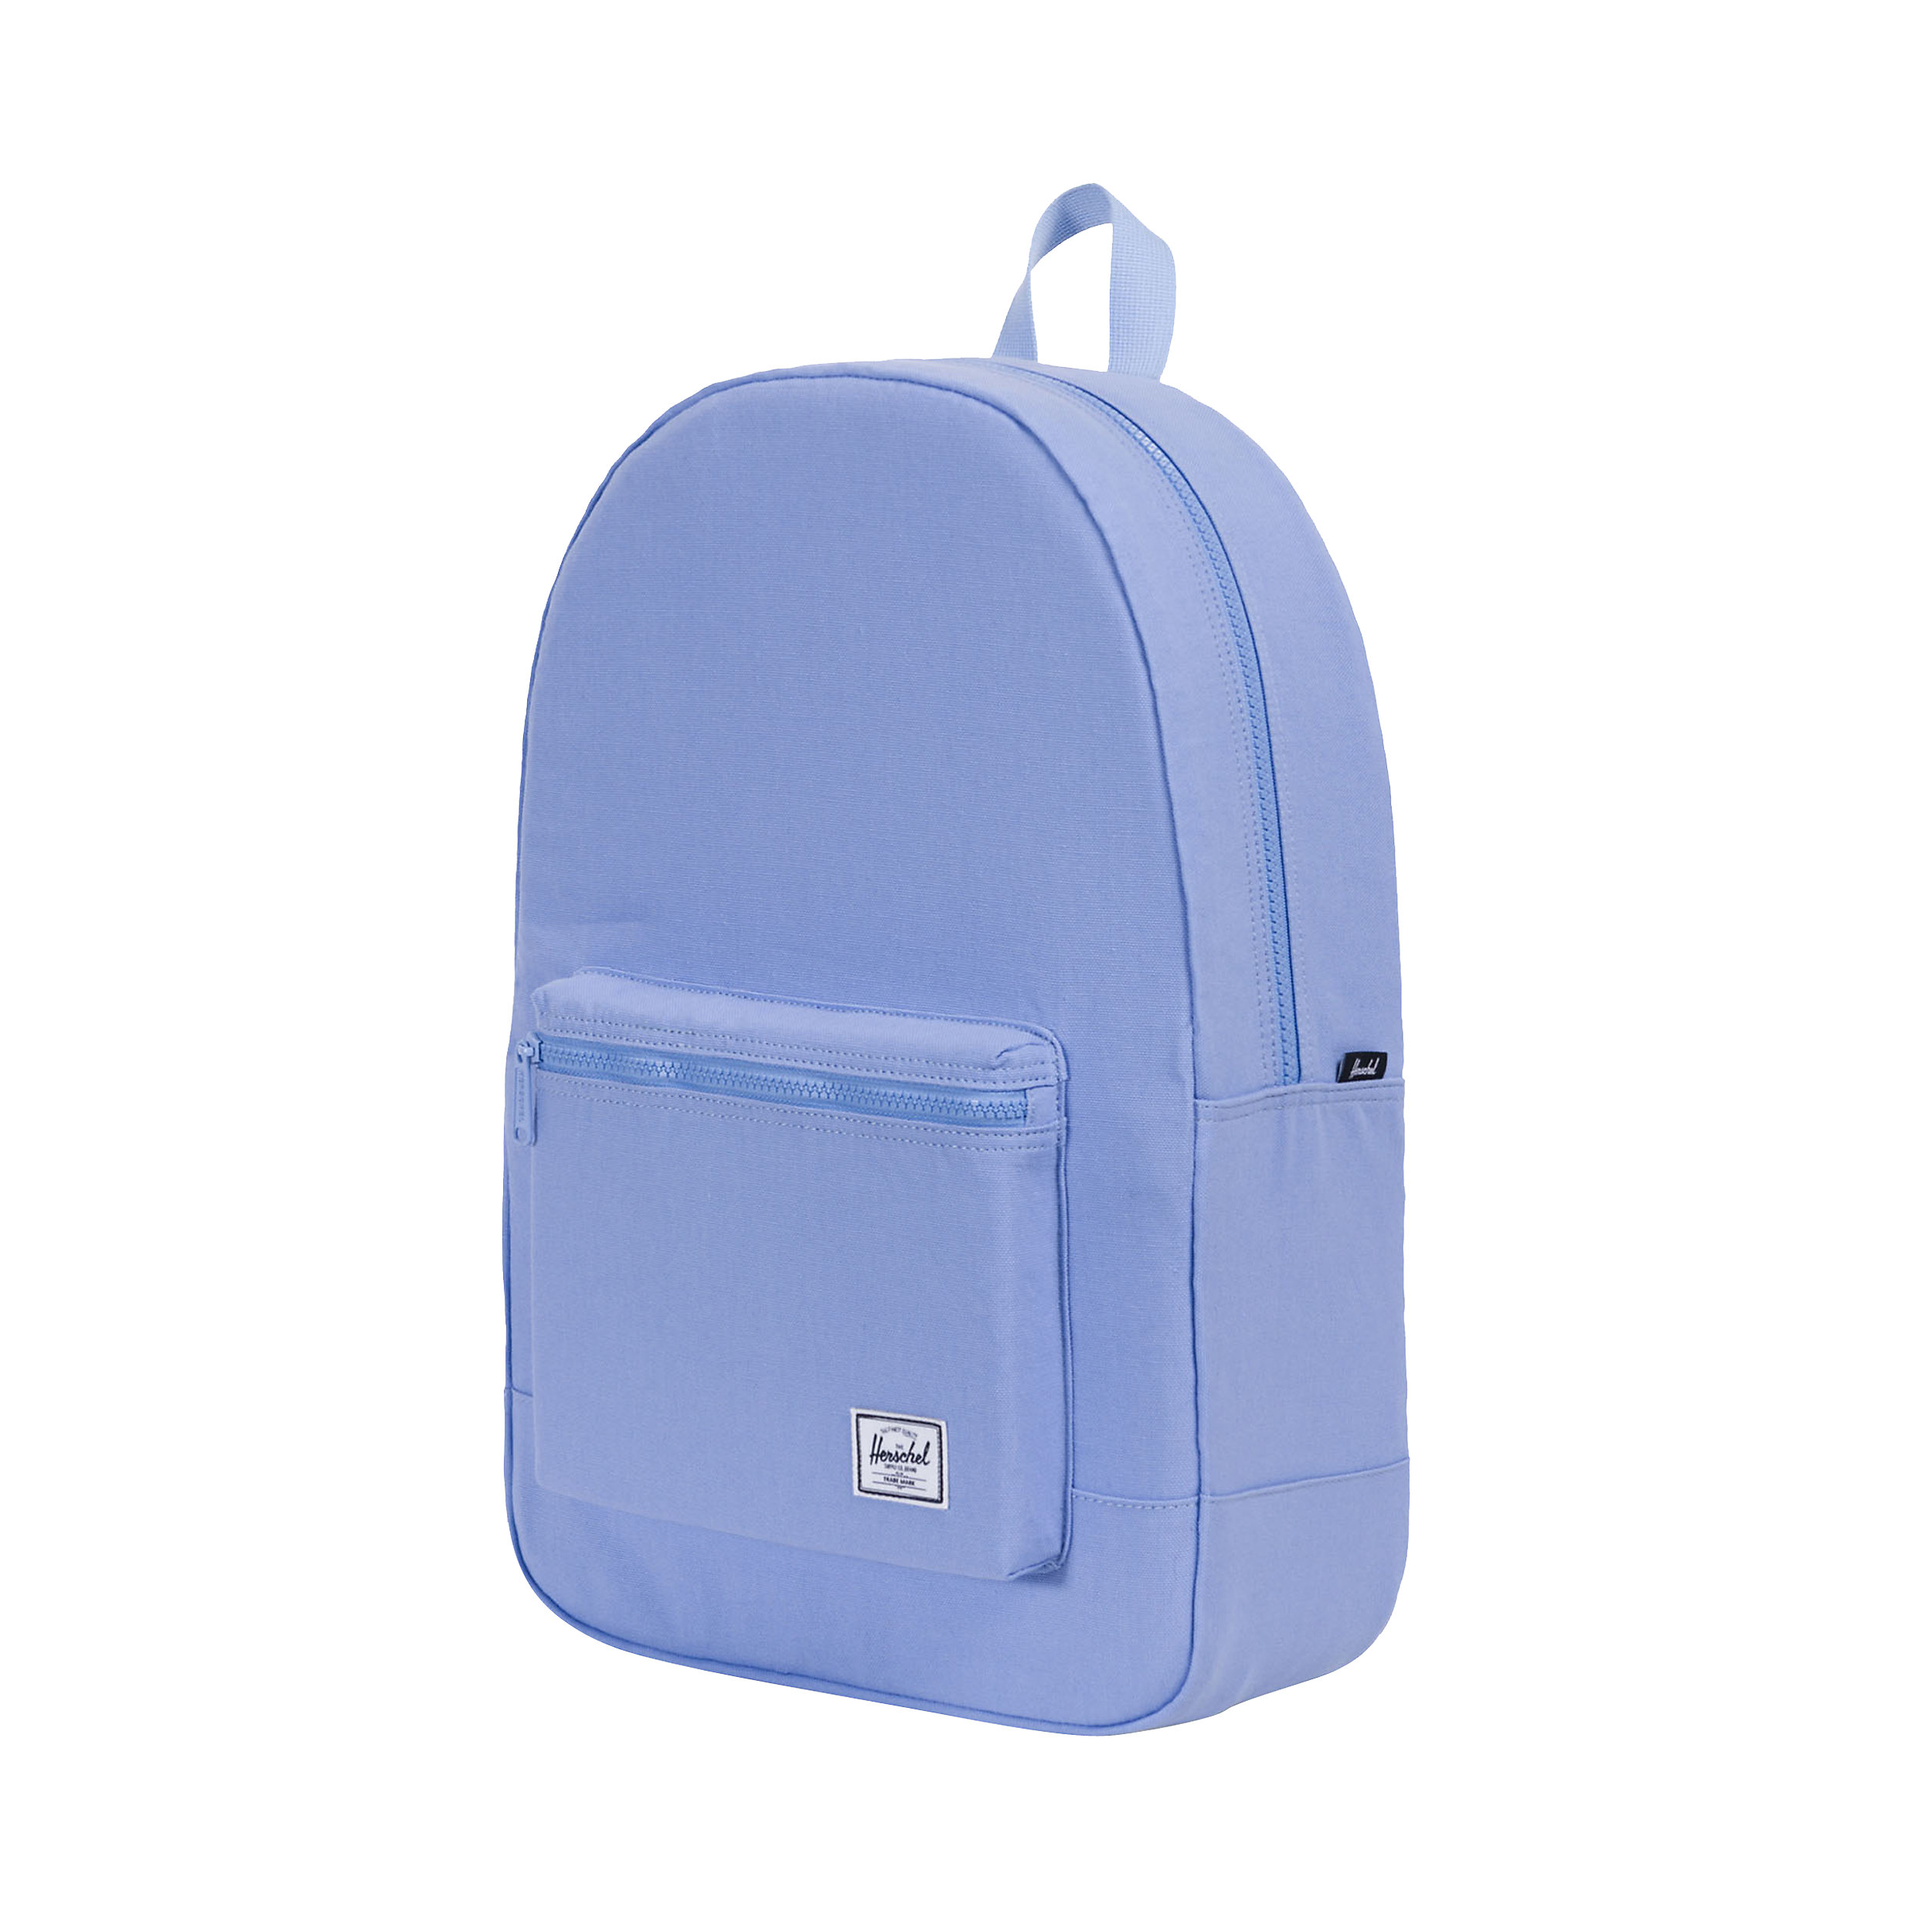 Rucksack Packable Daypack Cotton Casuals 24.5 Liter